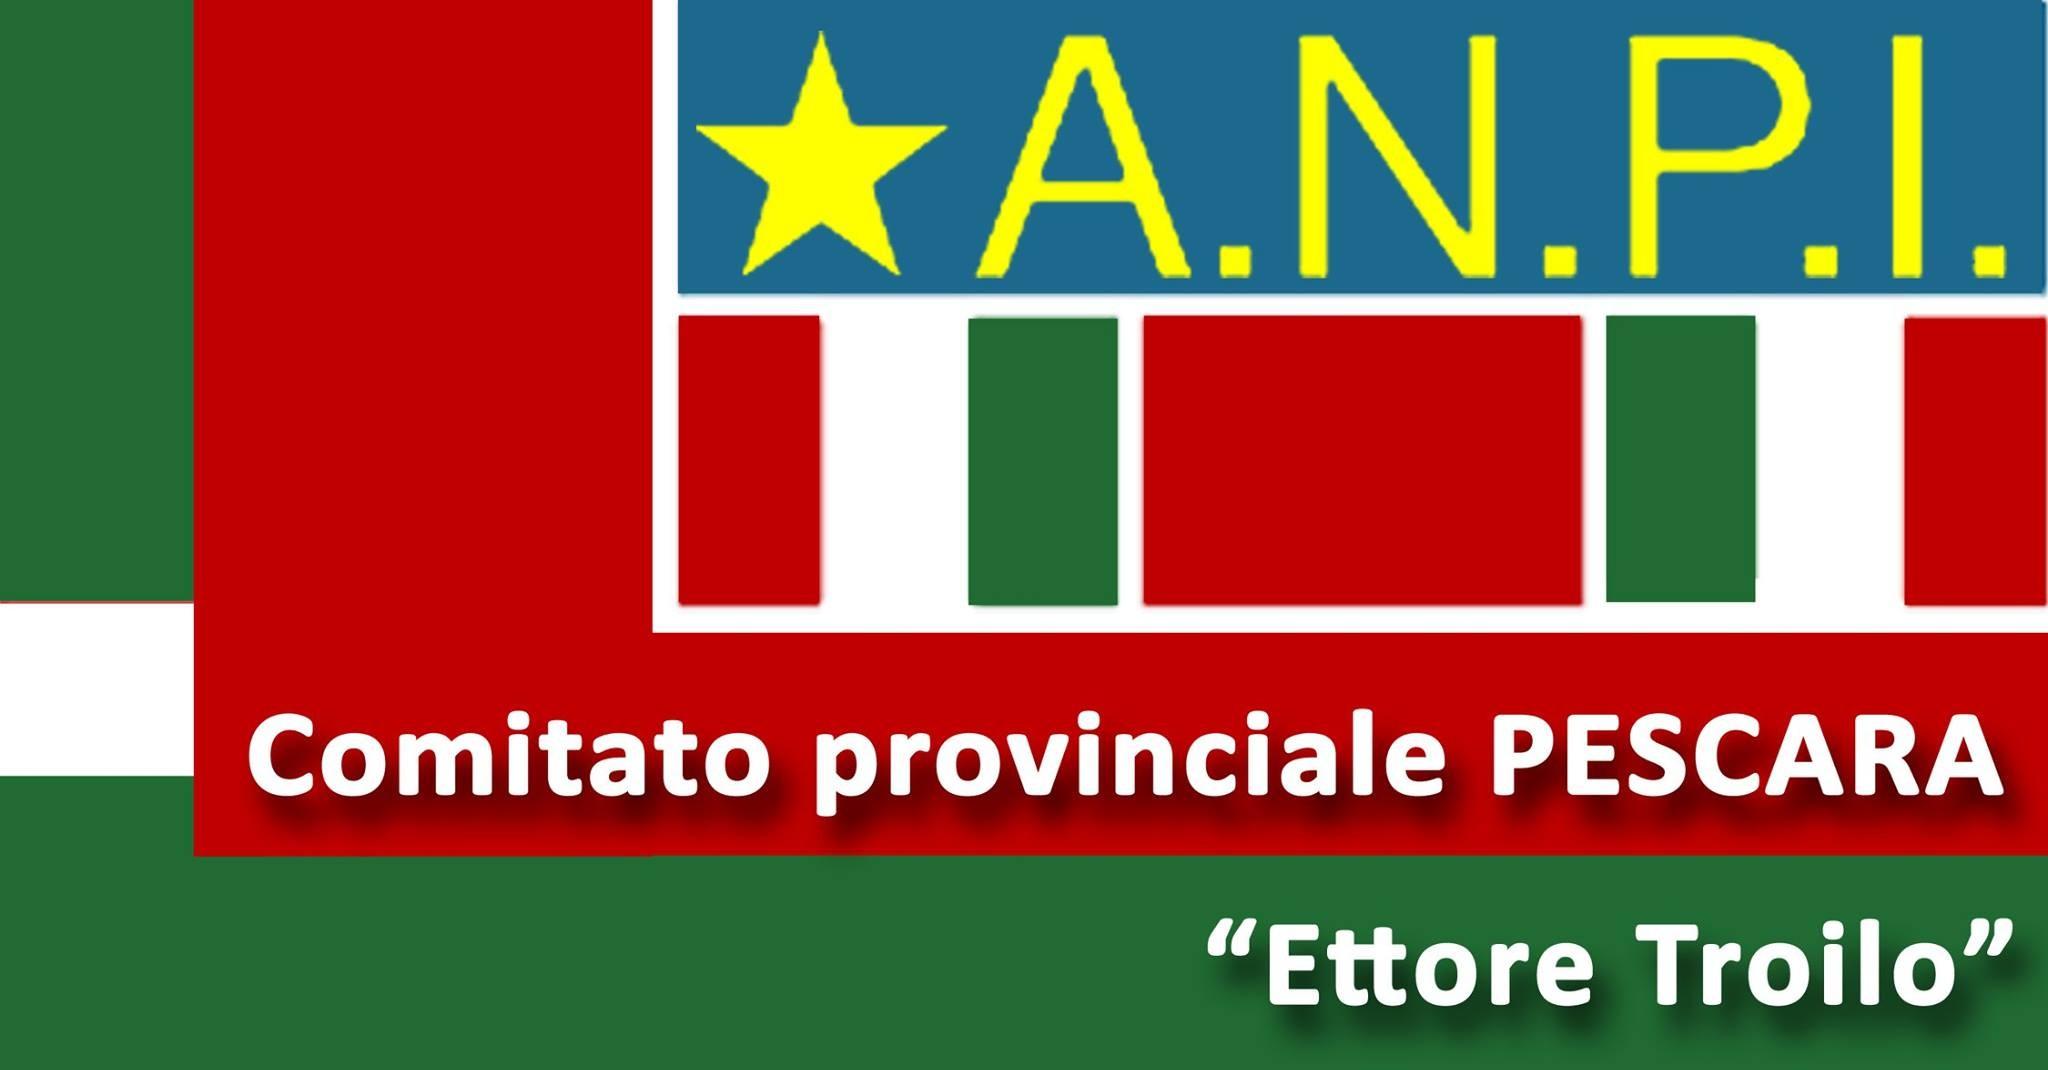 Anpi Pescara